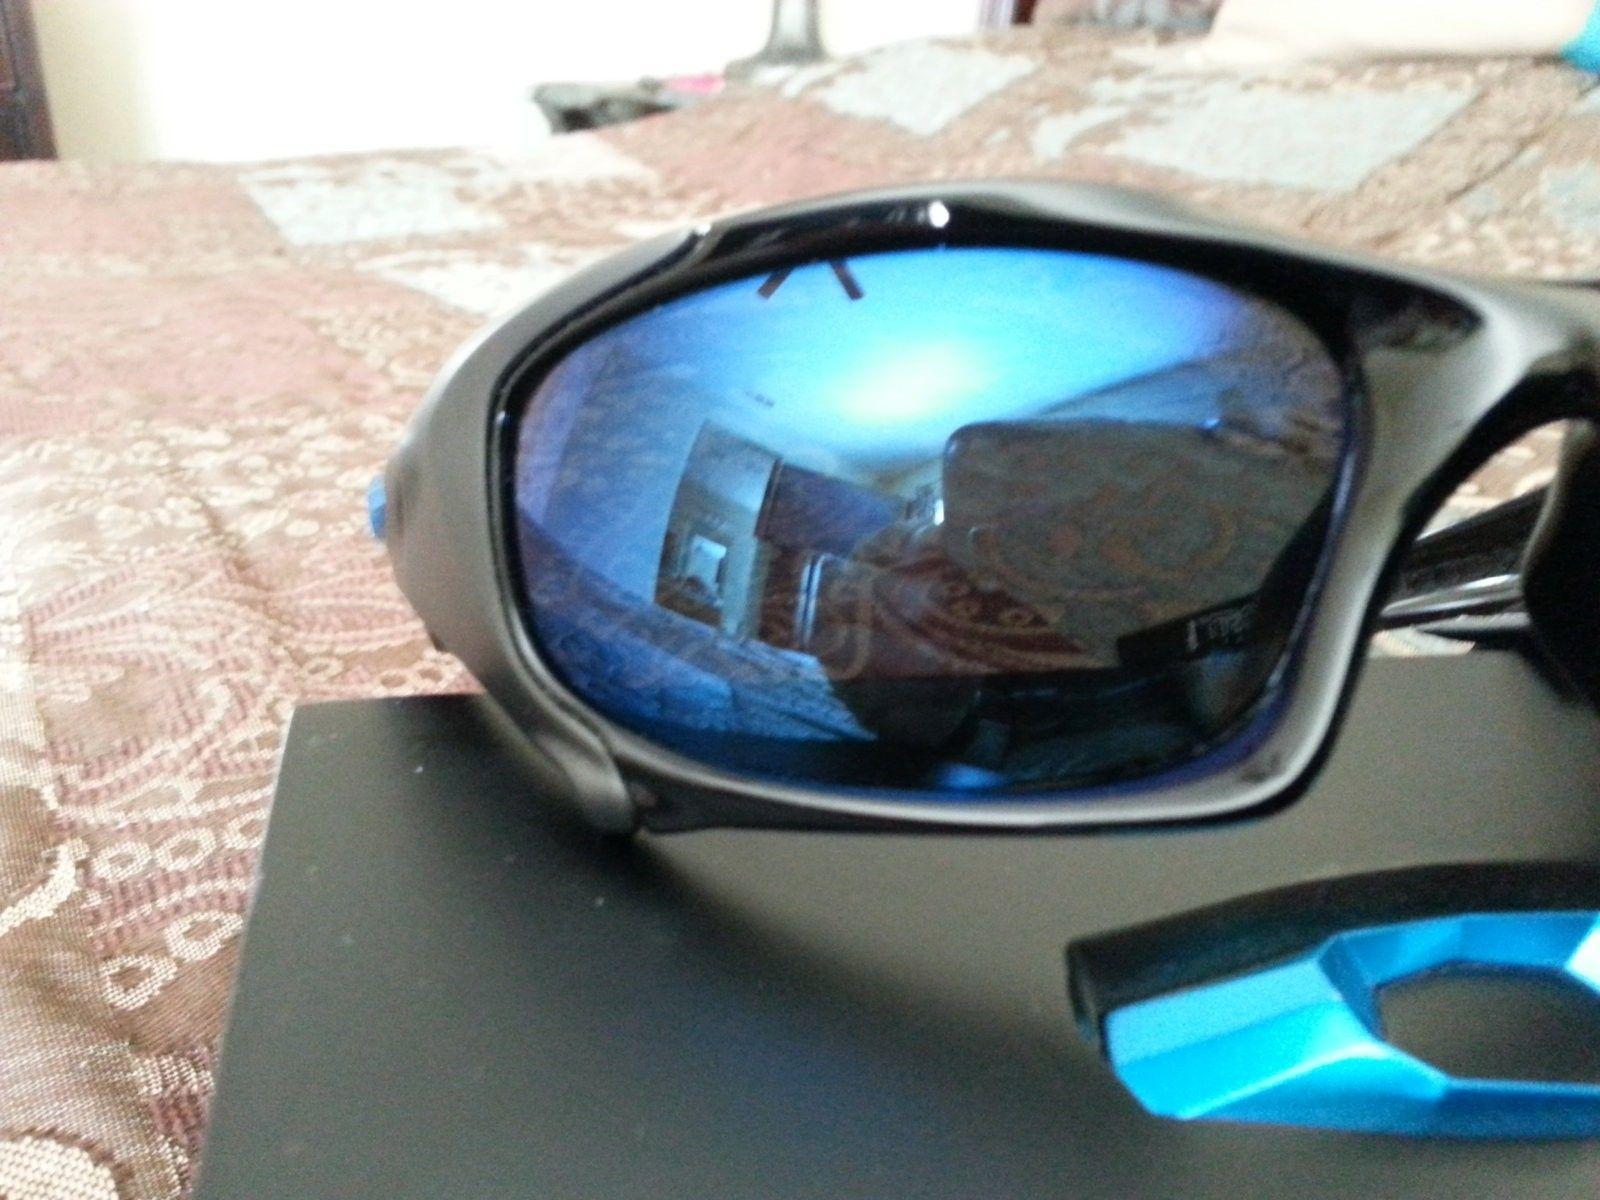 Ice Polarized Lens Cutting PB Tron… @Chris A Hardway - 20160805_184847.jpg